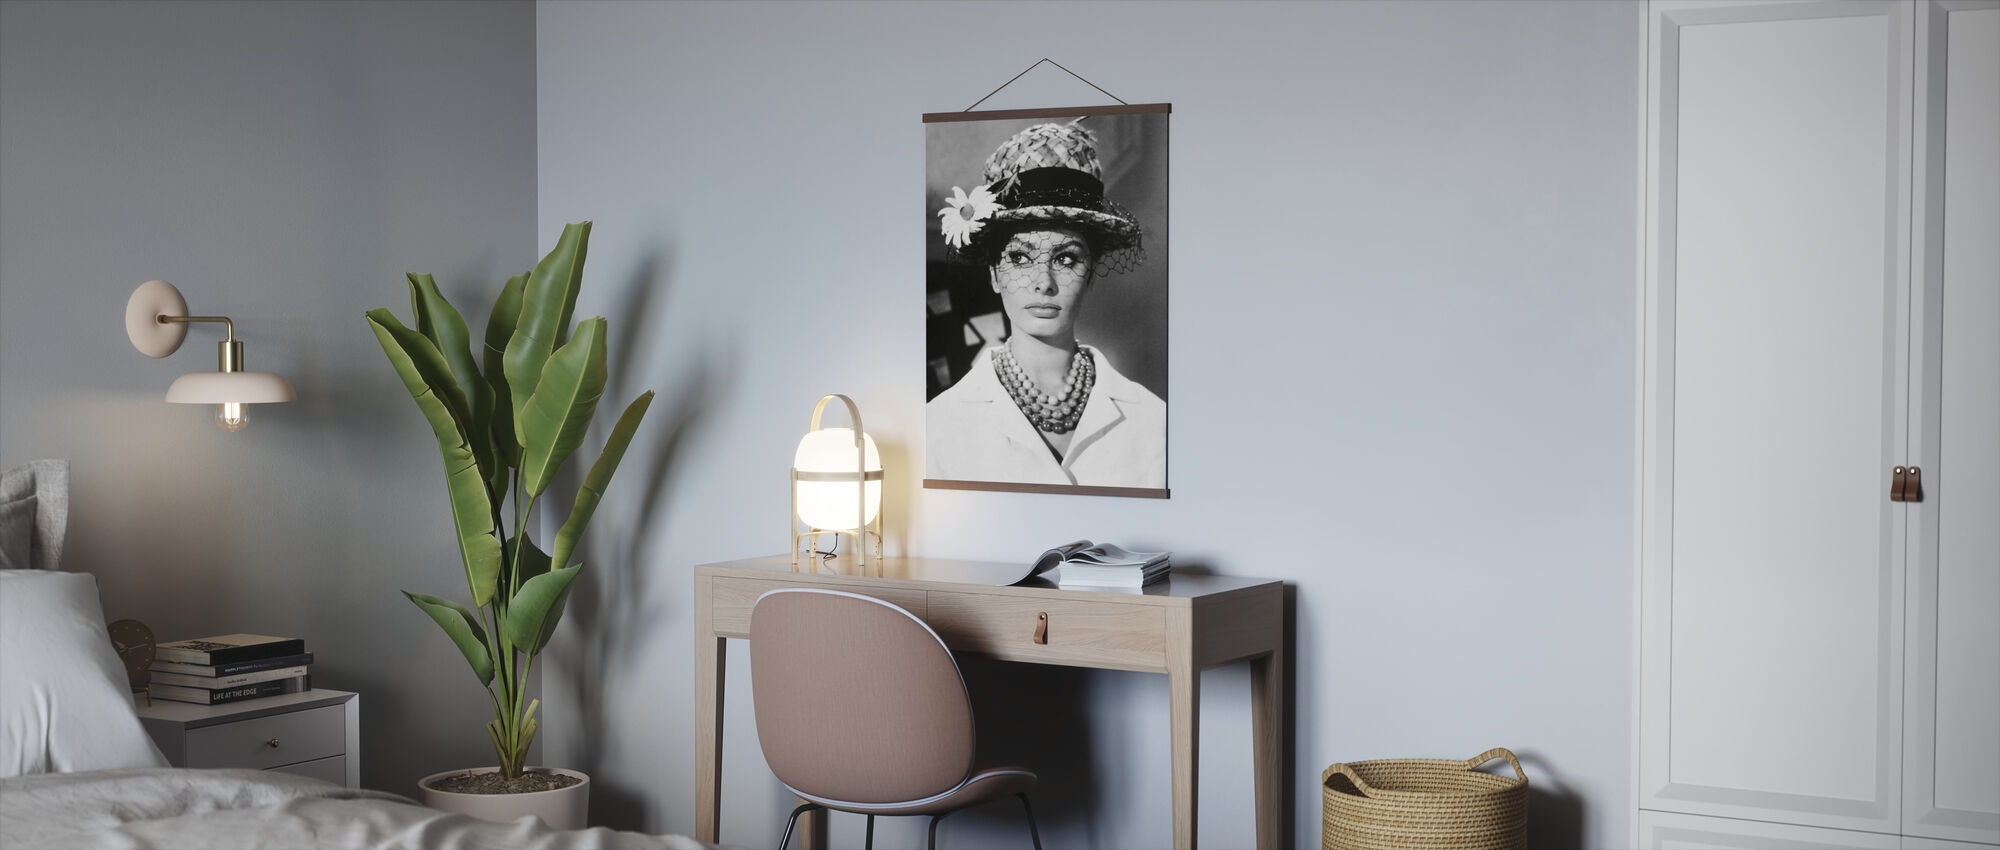 Millionairess - Sophia Loren - Poster - Office